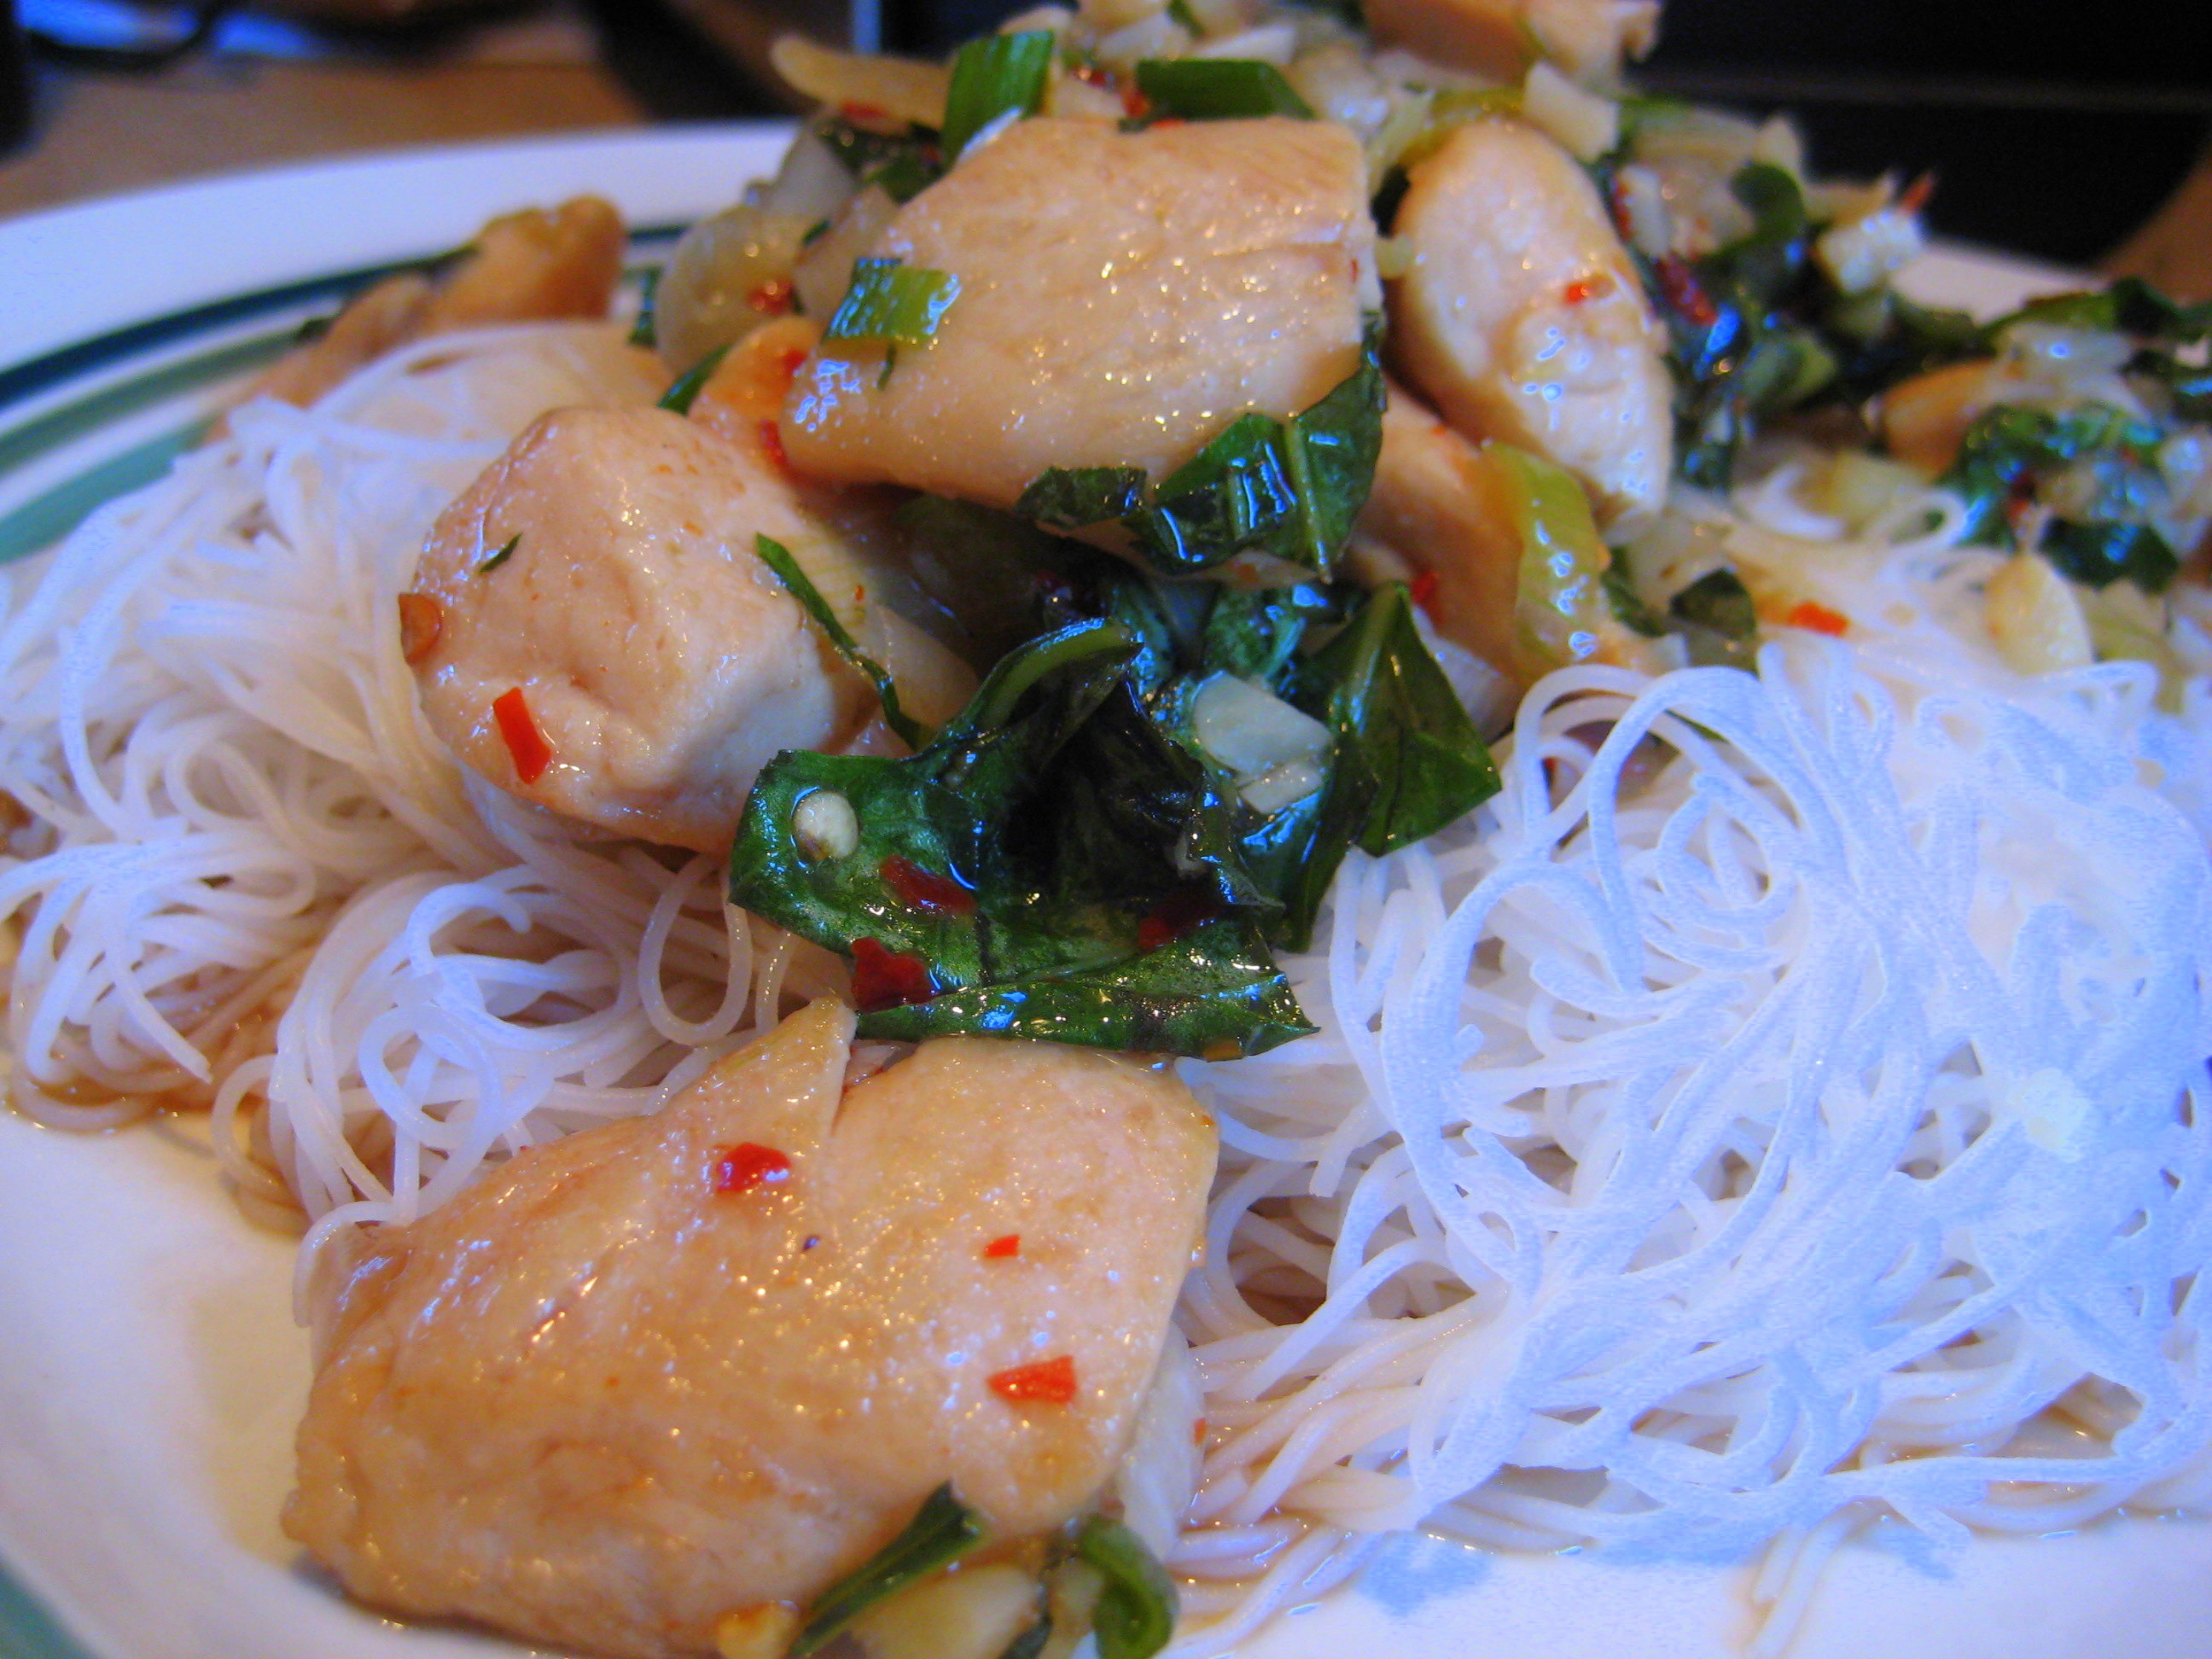 Healthy, spicy summer weeknight meal